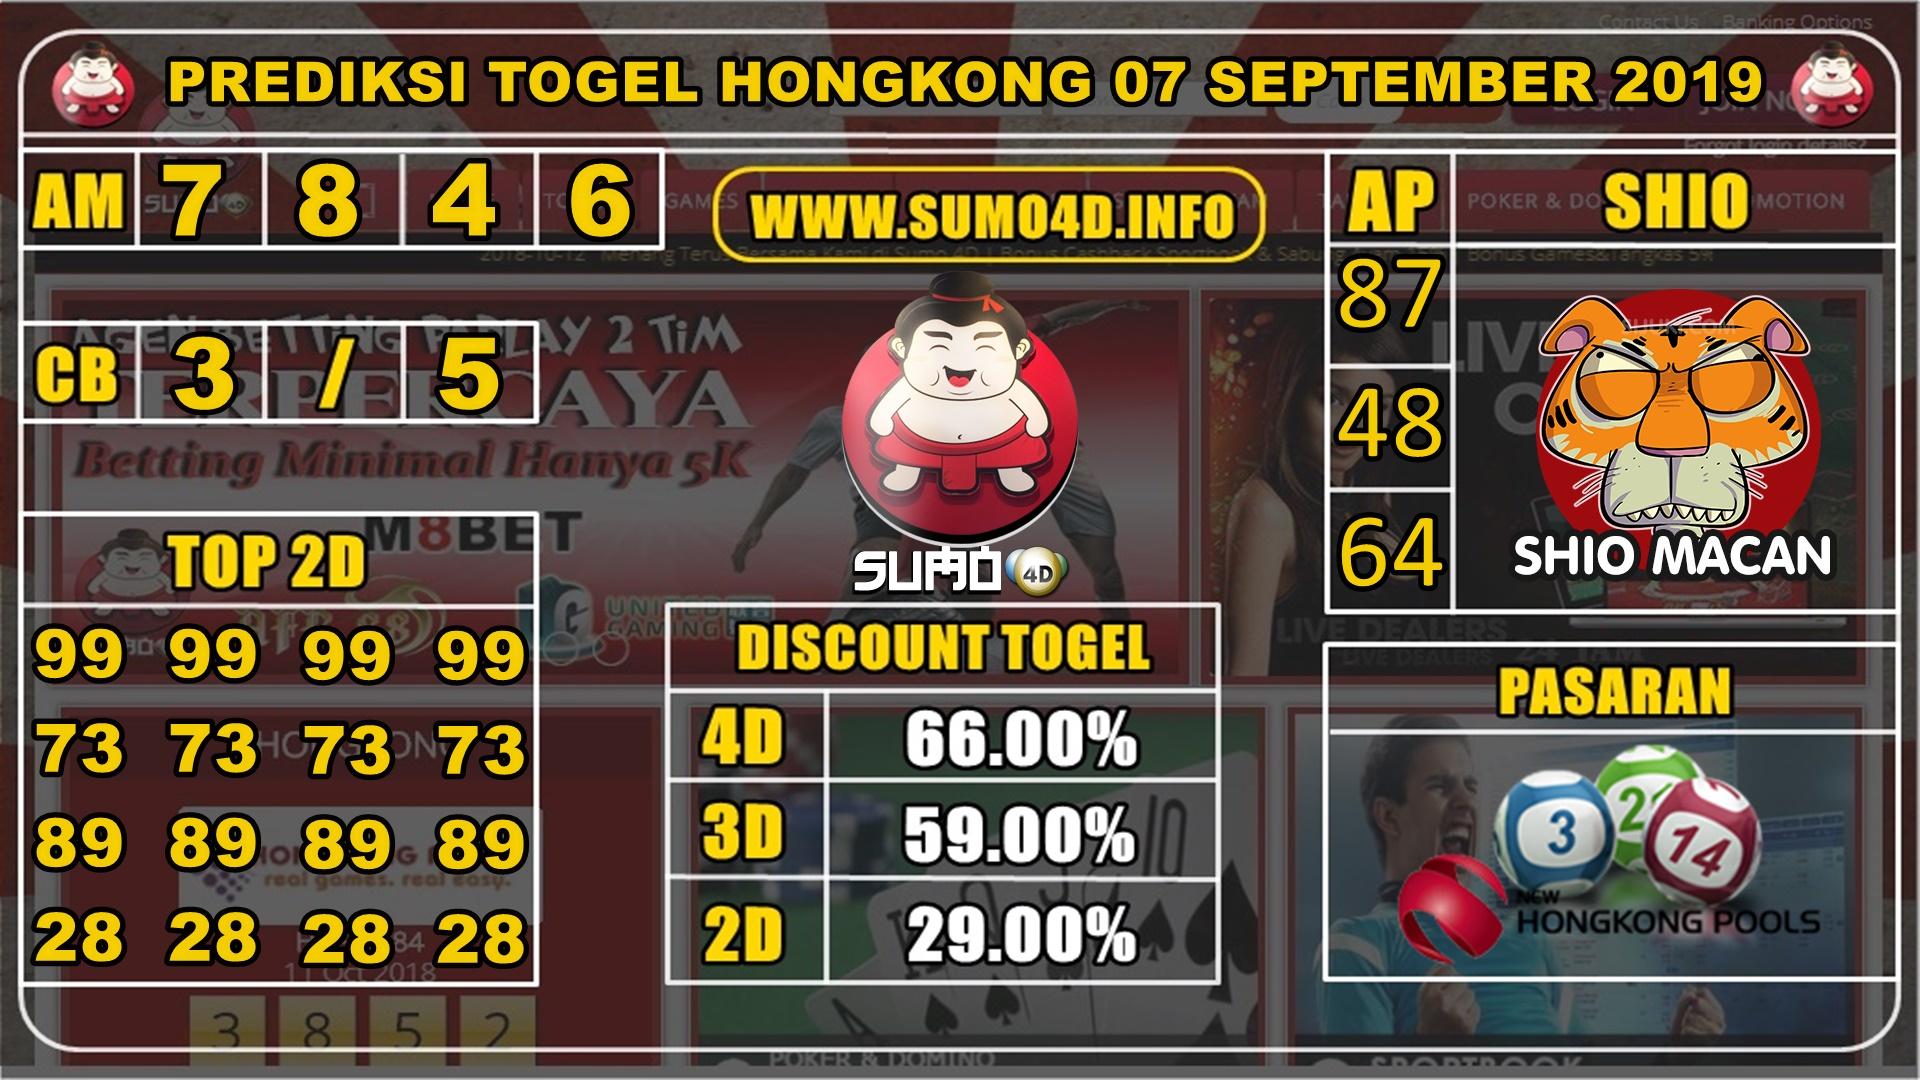 PREDIKSI TOGEL HONGKONG POOLS 07 SEPTEMBER 2019